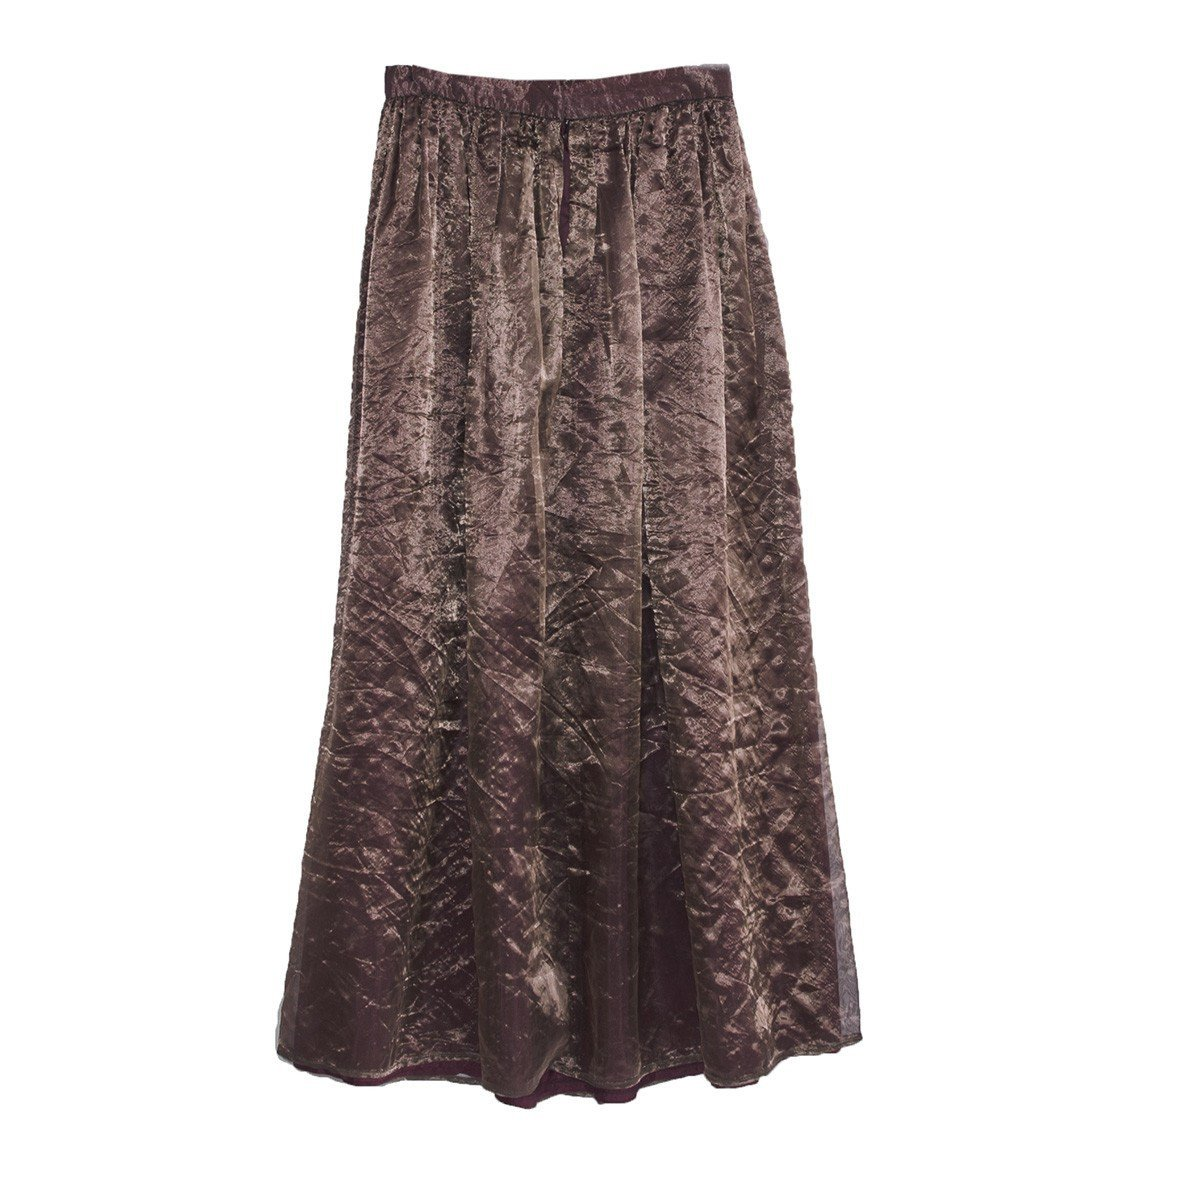 1980s Copper Floor-Length Skirt, Silk & Metallic